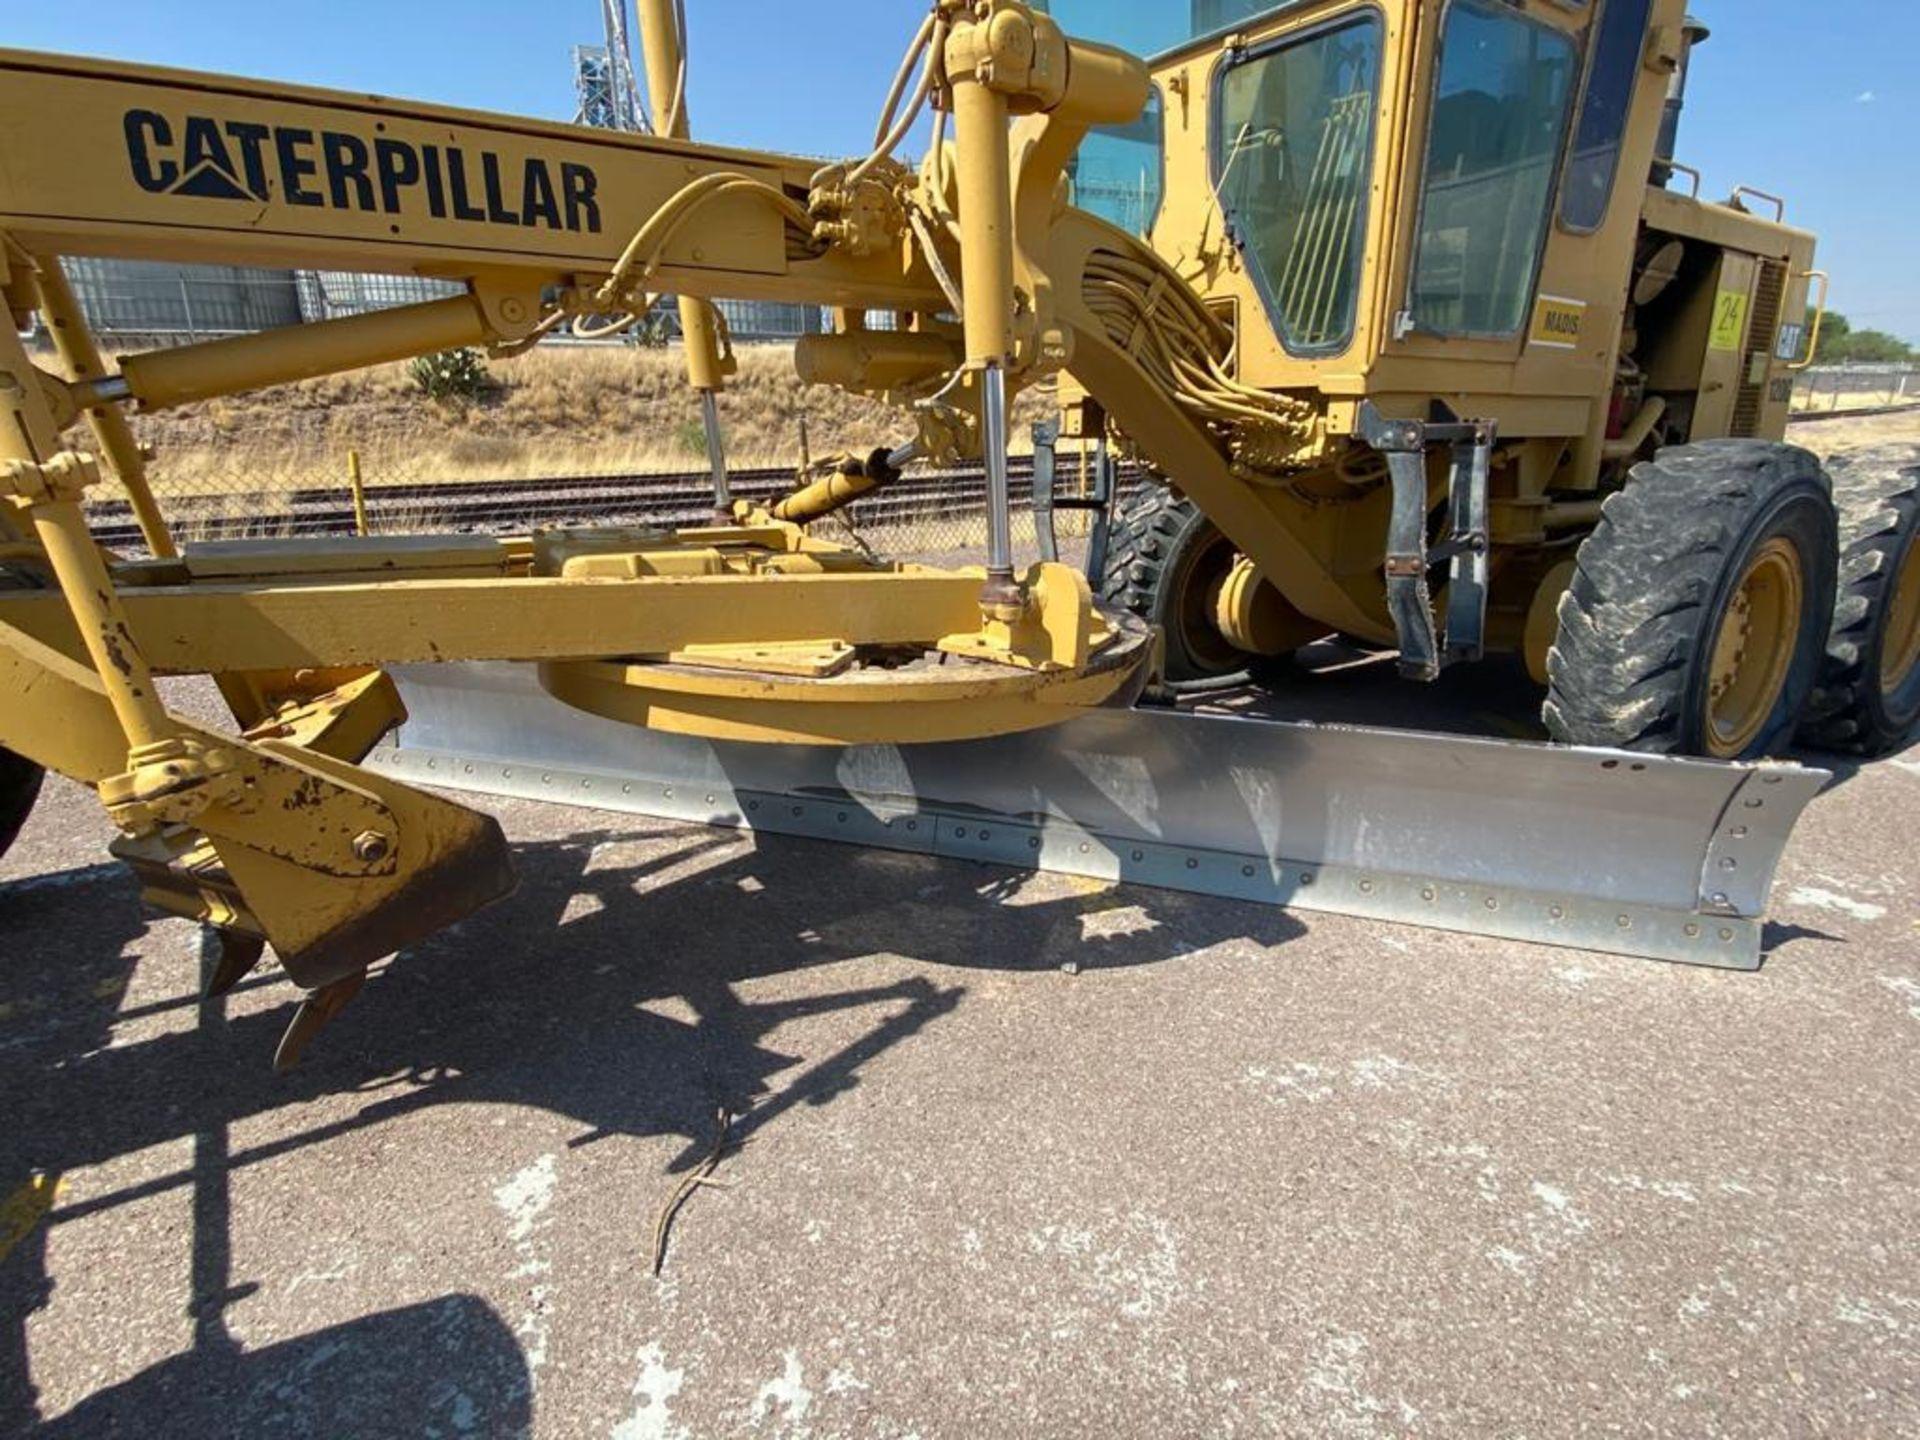 Caterpillar 120G Motor Grader, Serial number 87V09646, Motor number PQ883-2/07Z28983 - Image 31 of 61